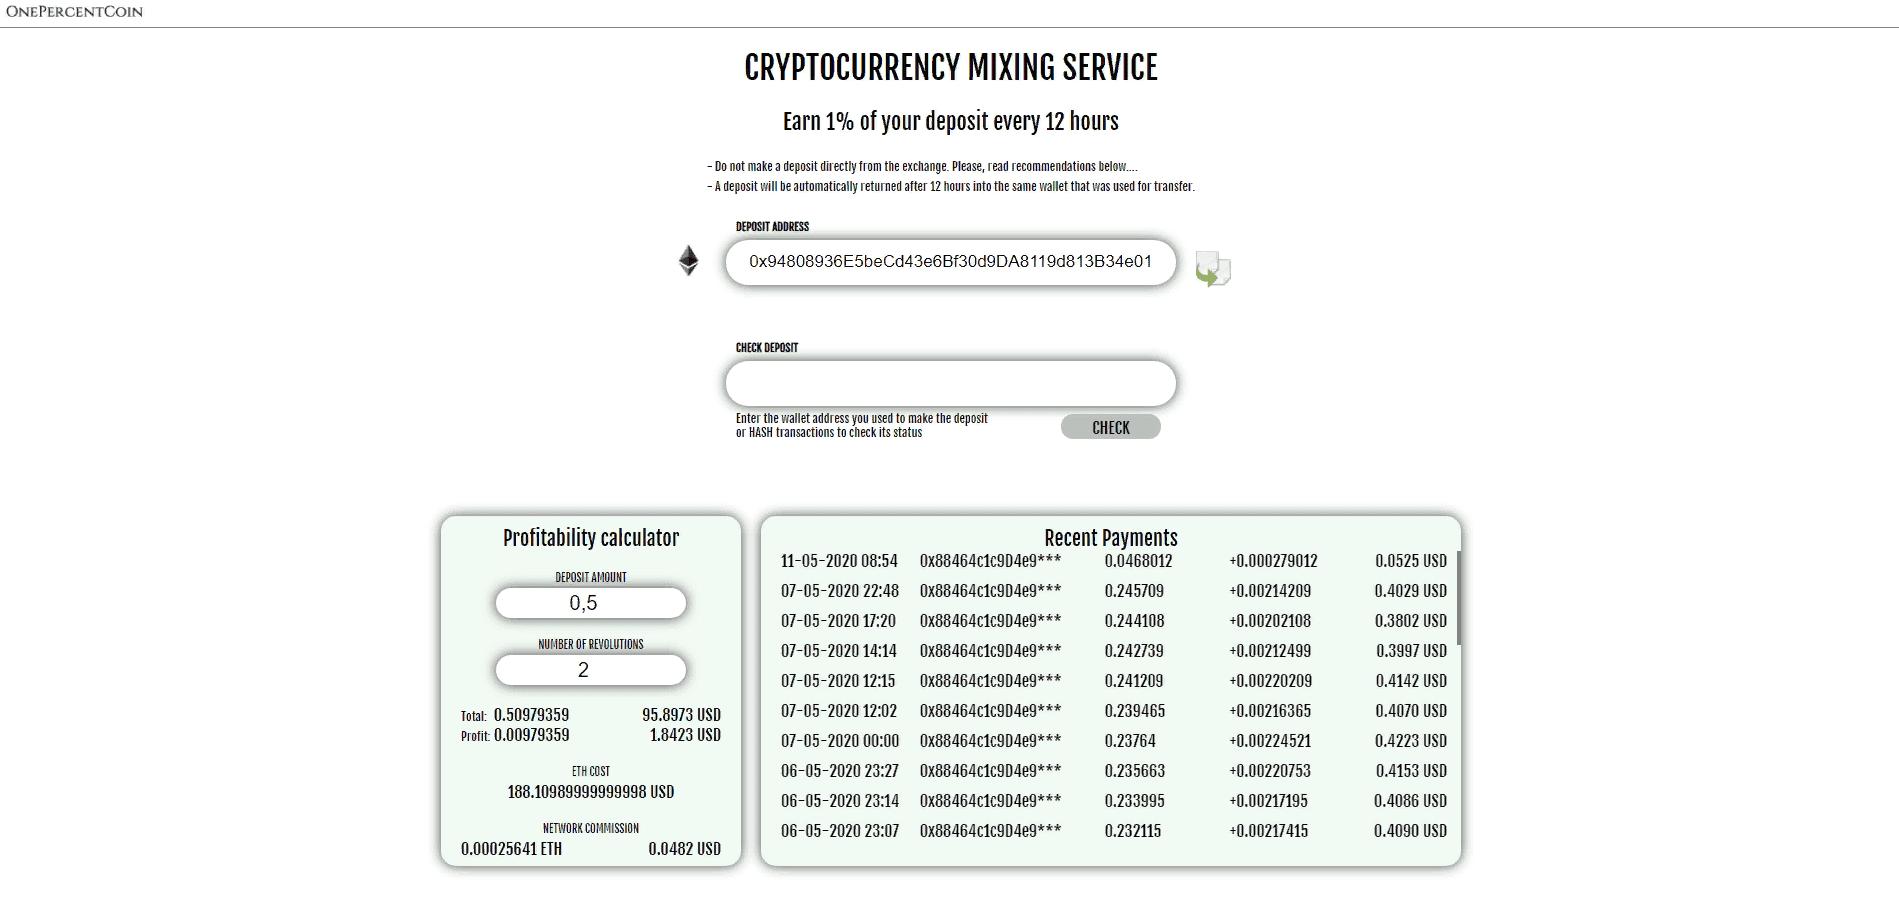 OnePercentCoin